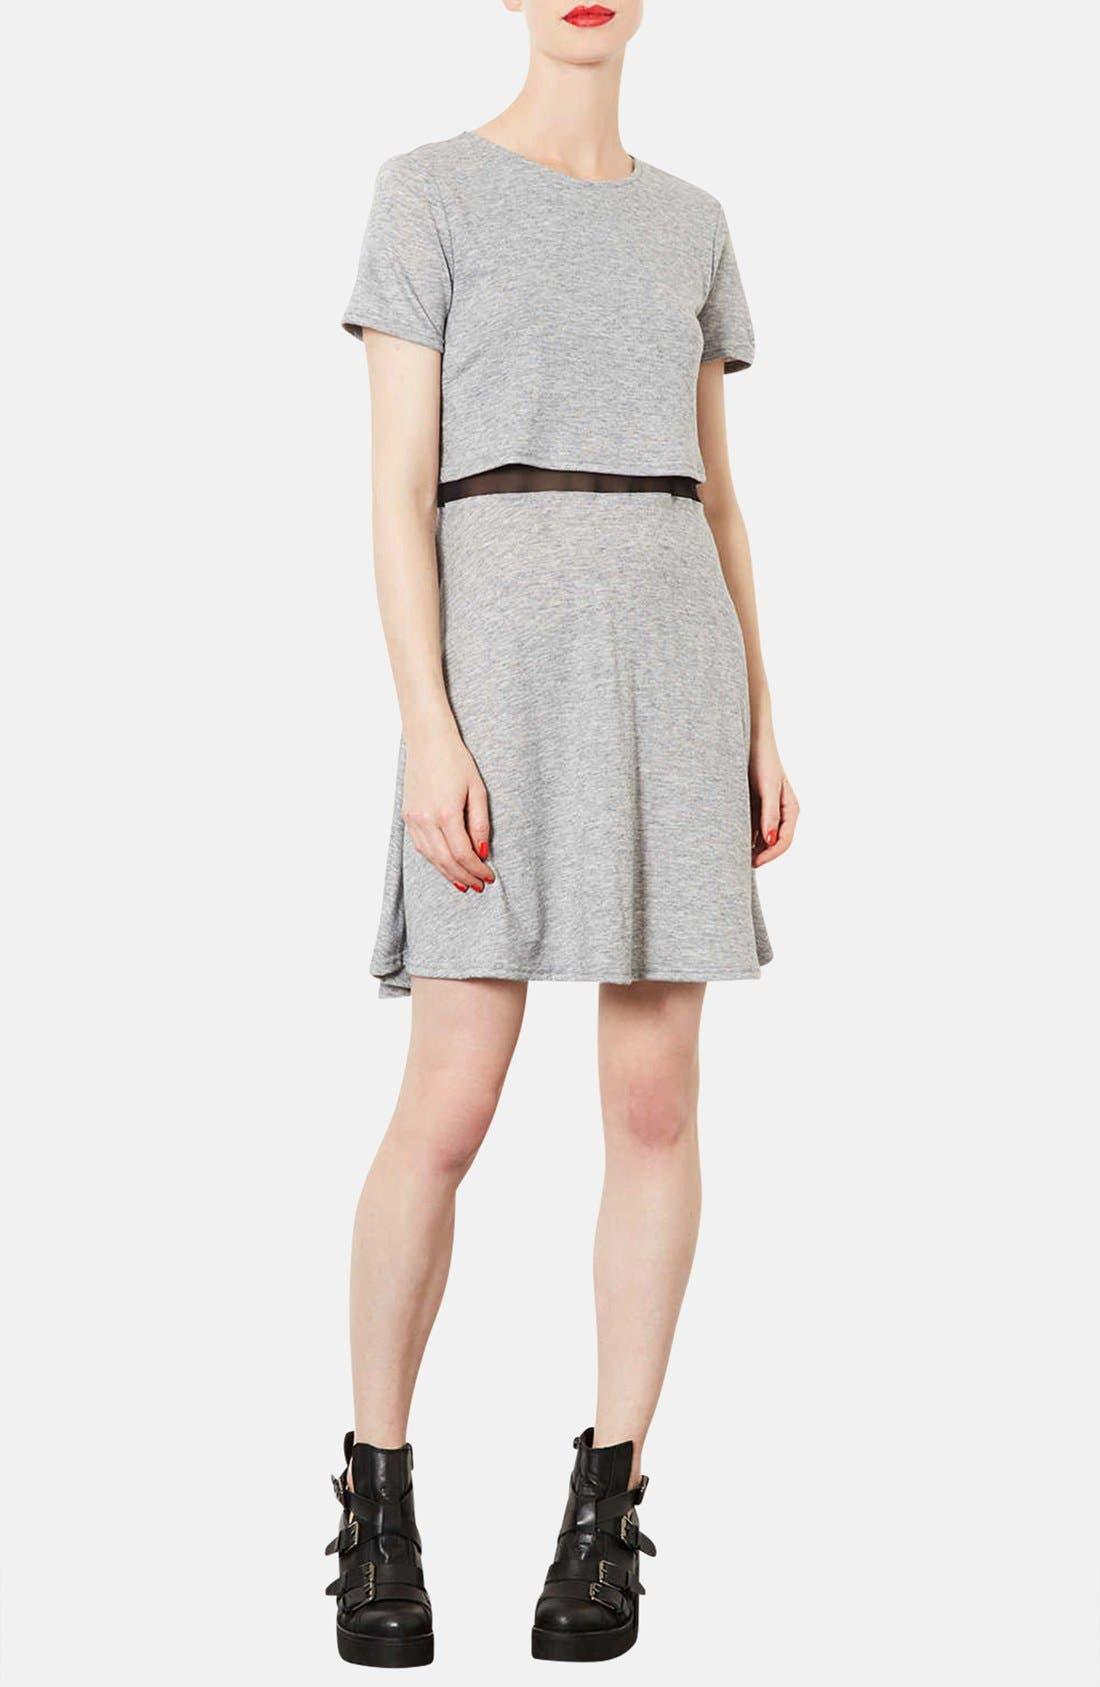 Alternate Image 1 Selected - Topshop Mesh Inset Overlay Shift Dress